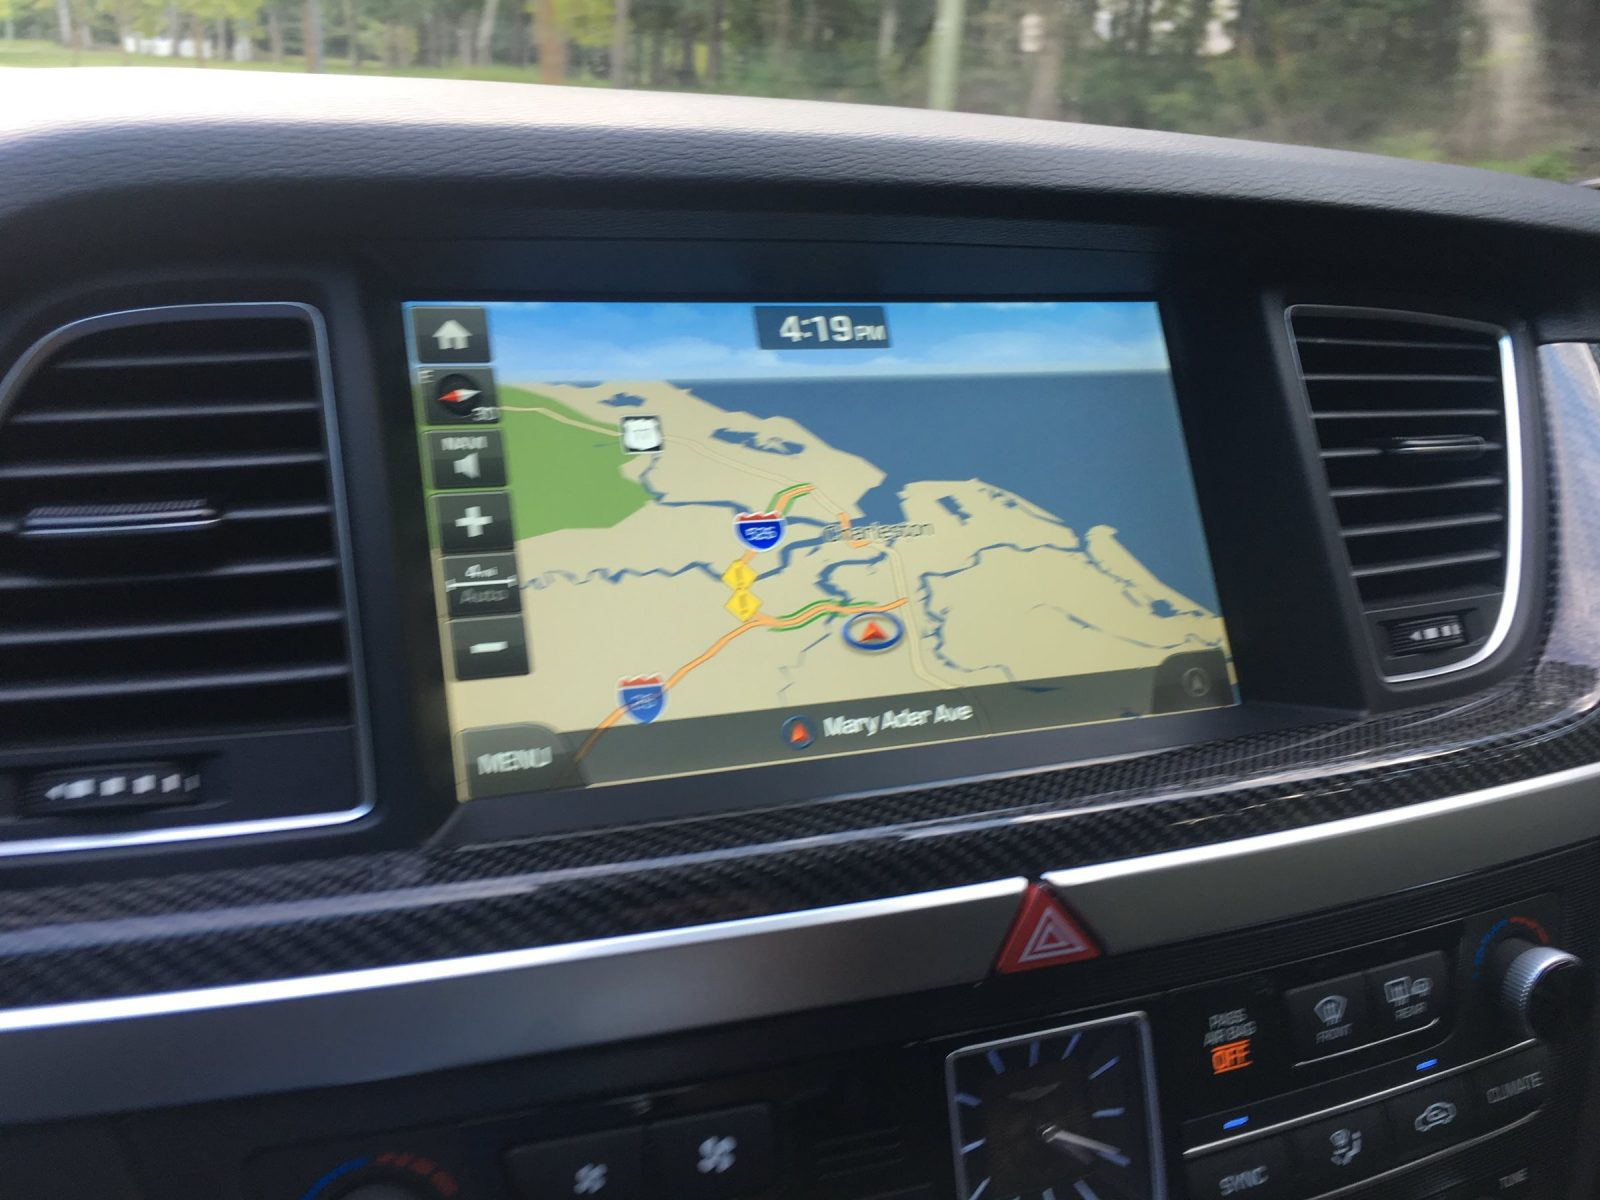 2018 genesis g80 interior.  2018 home  2018 genesis g80 sport awd u2013 hd road test review  interior 22 inside genesis g80 interior